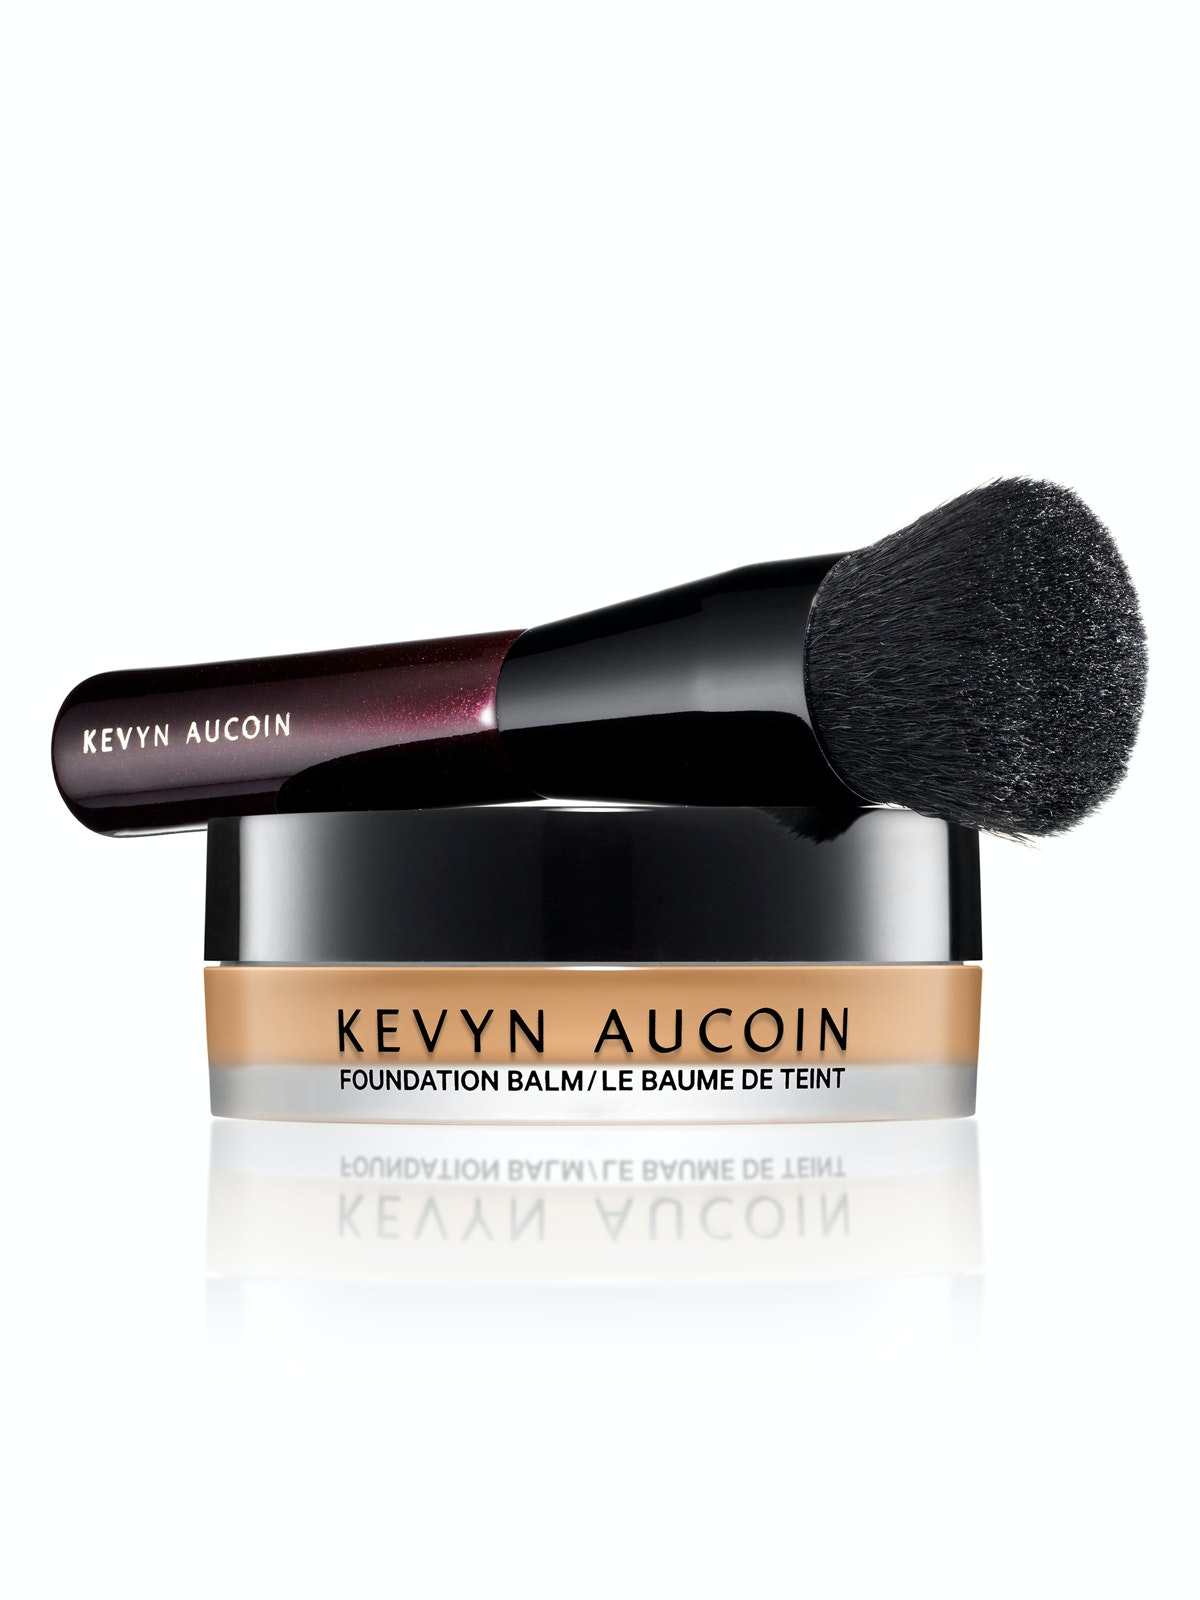 Kevyn Aucoin Foundation Balm